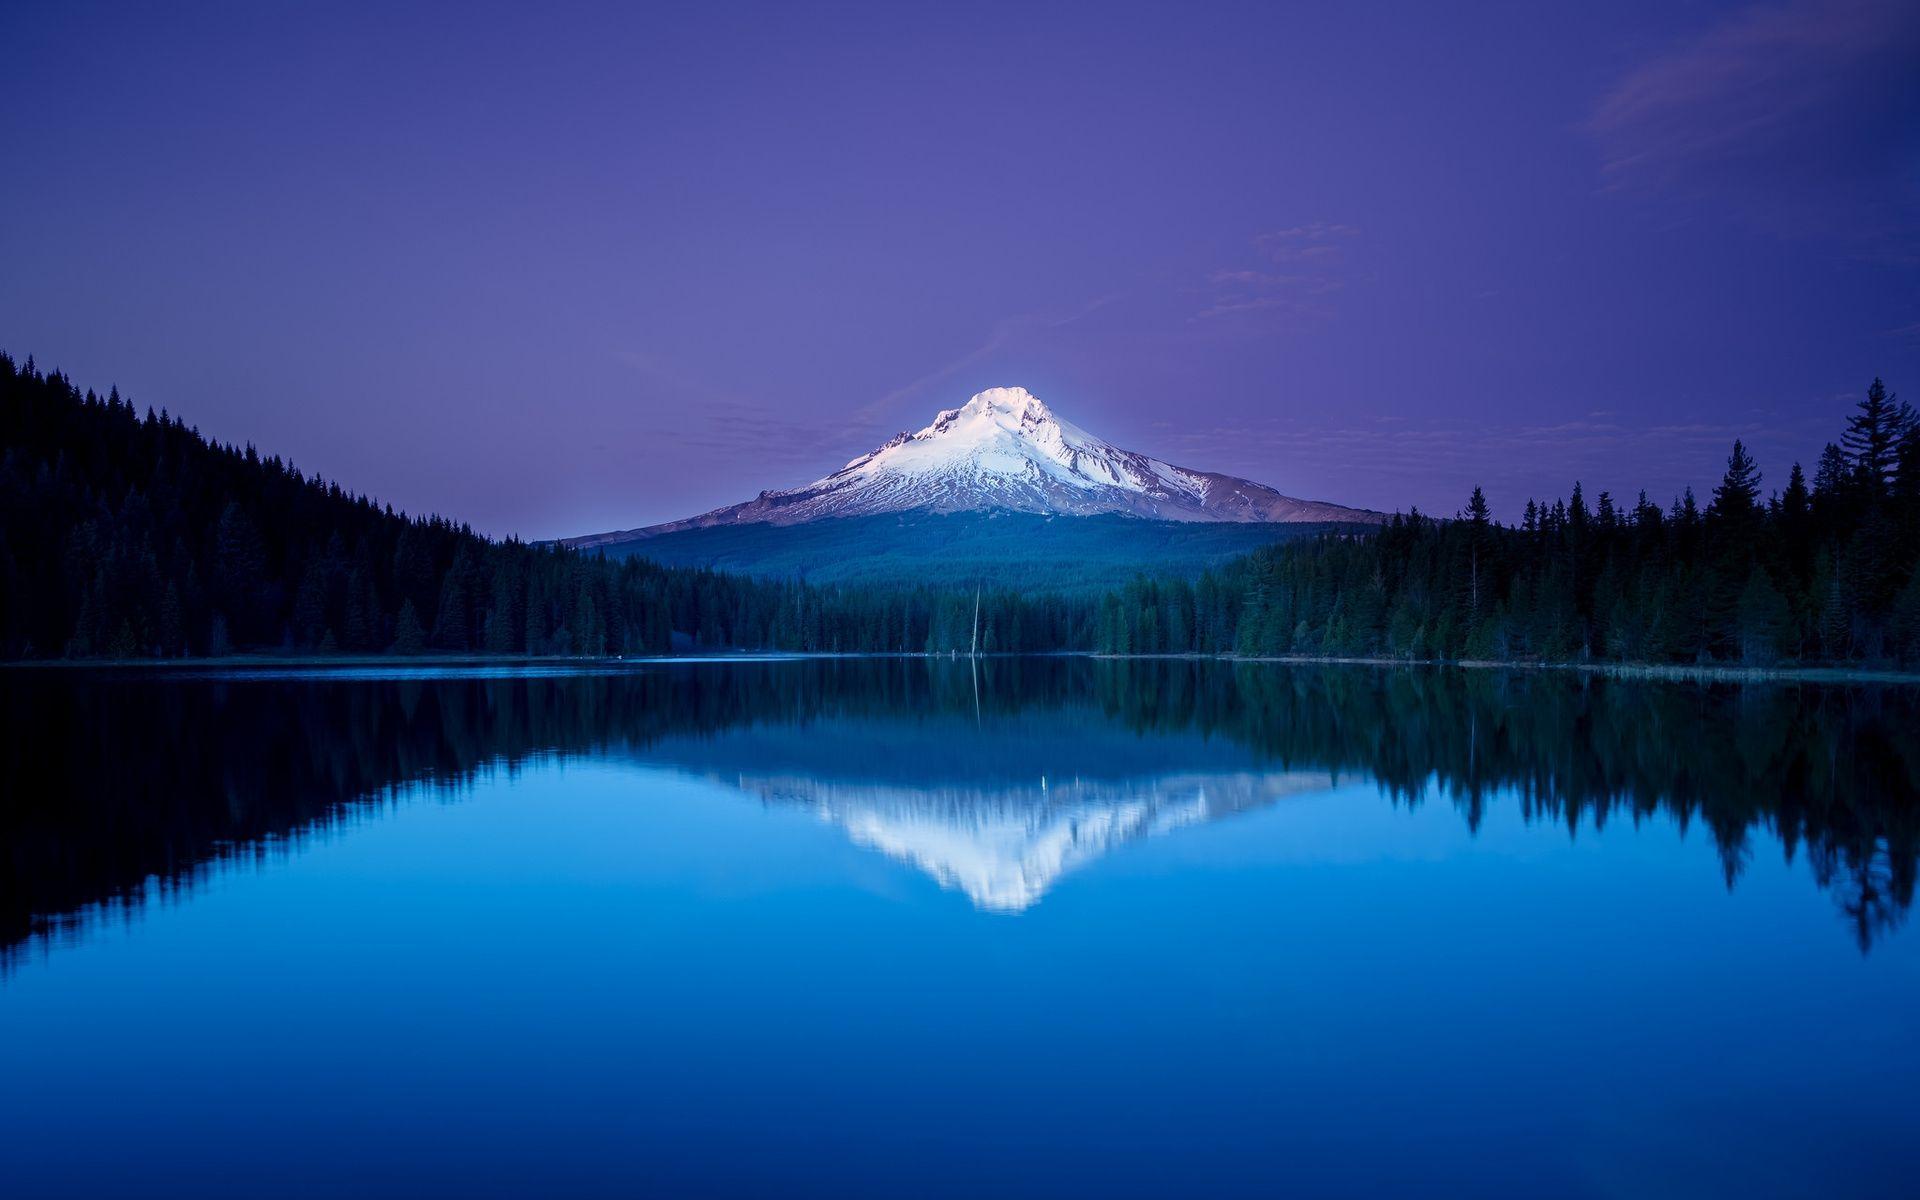 Lake Reflections Wallpapers